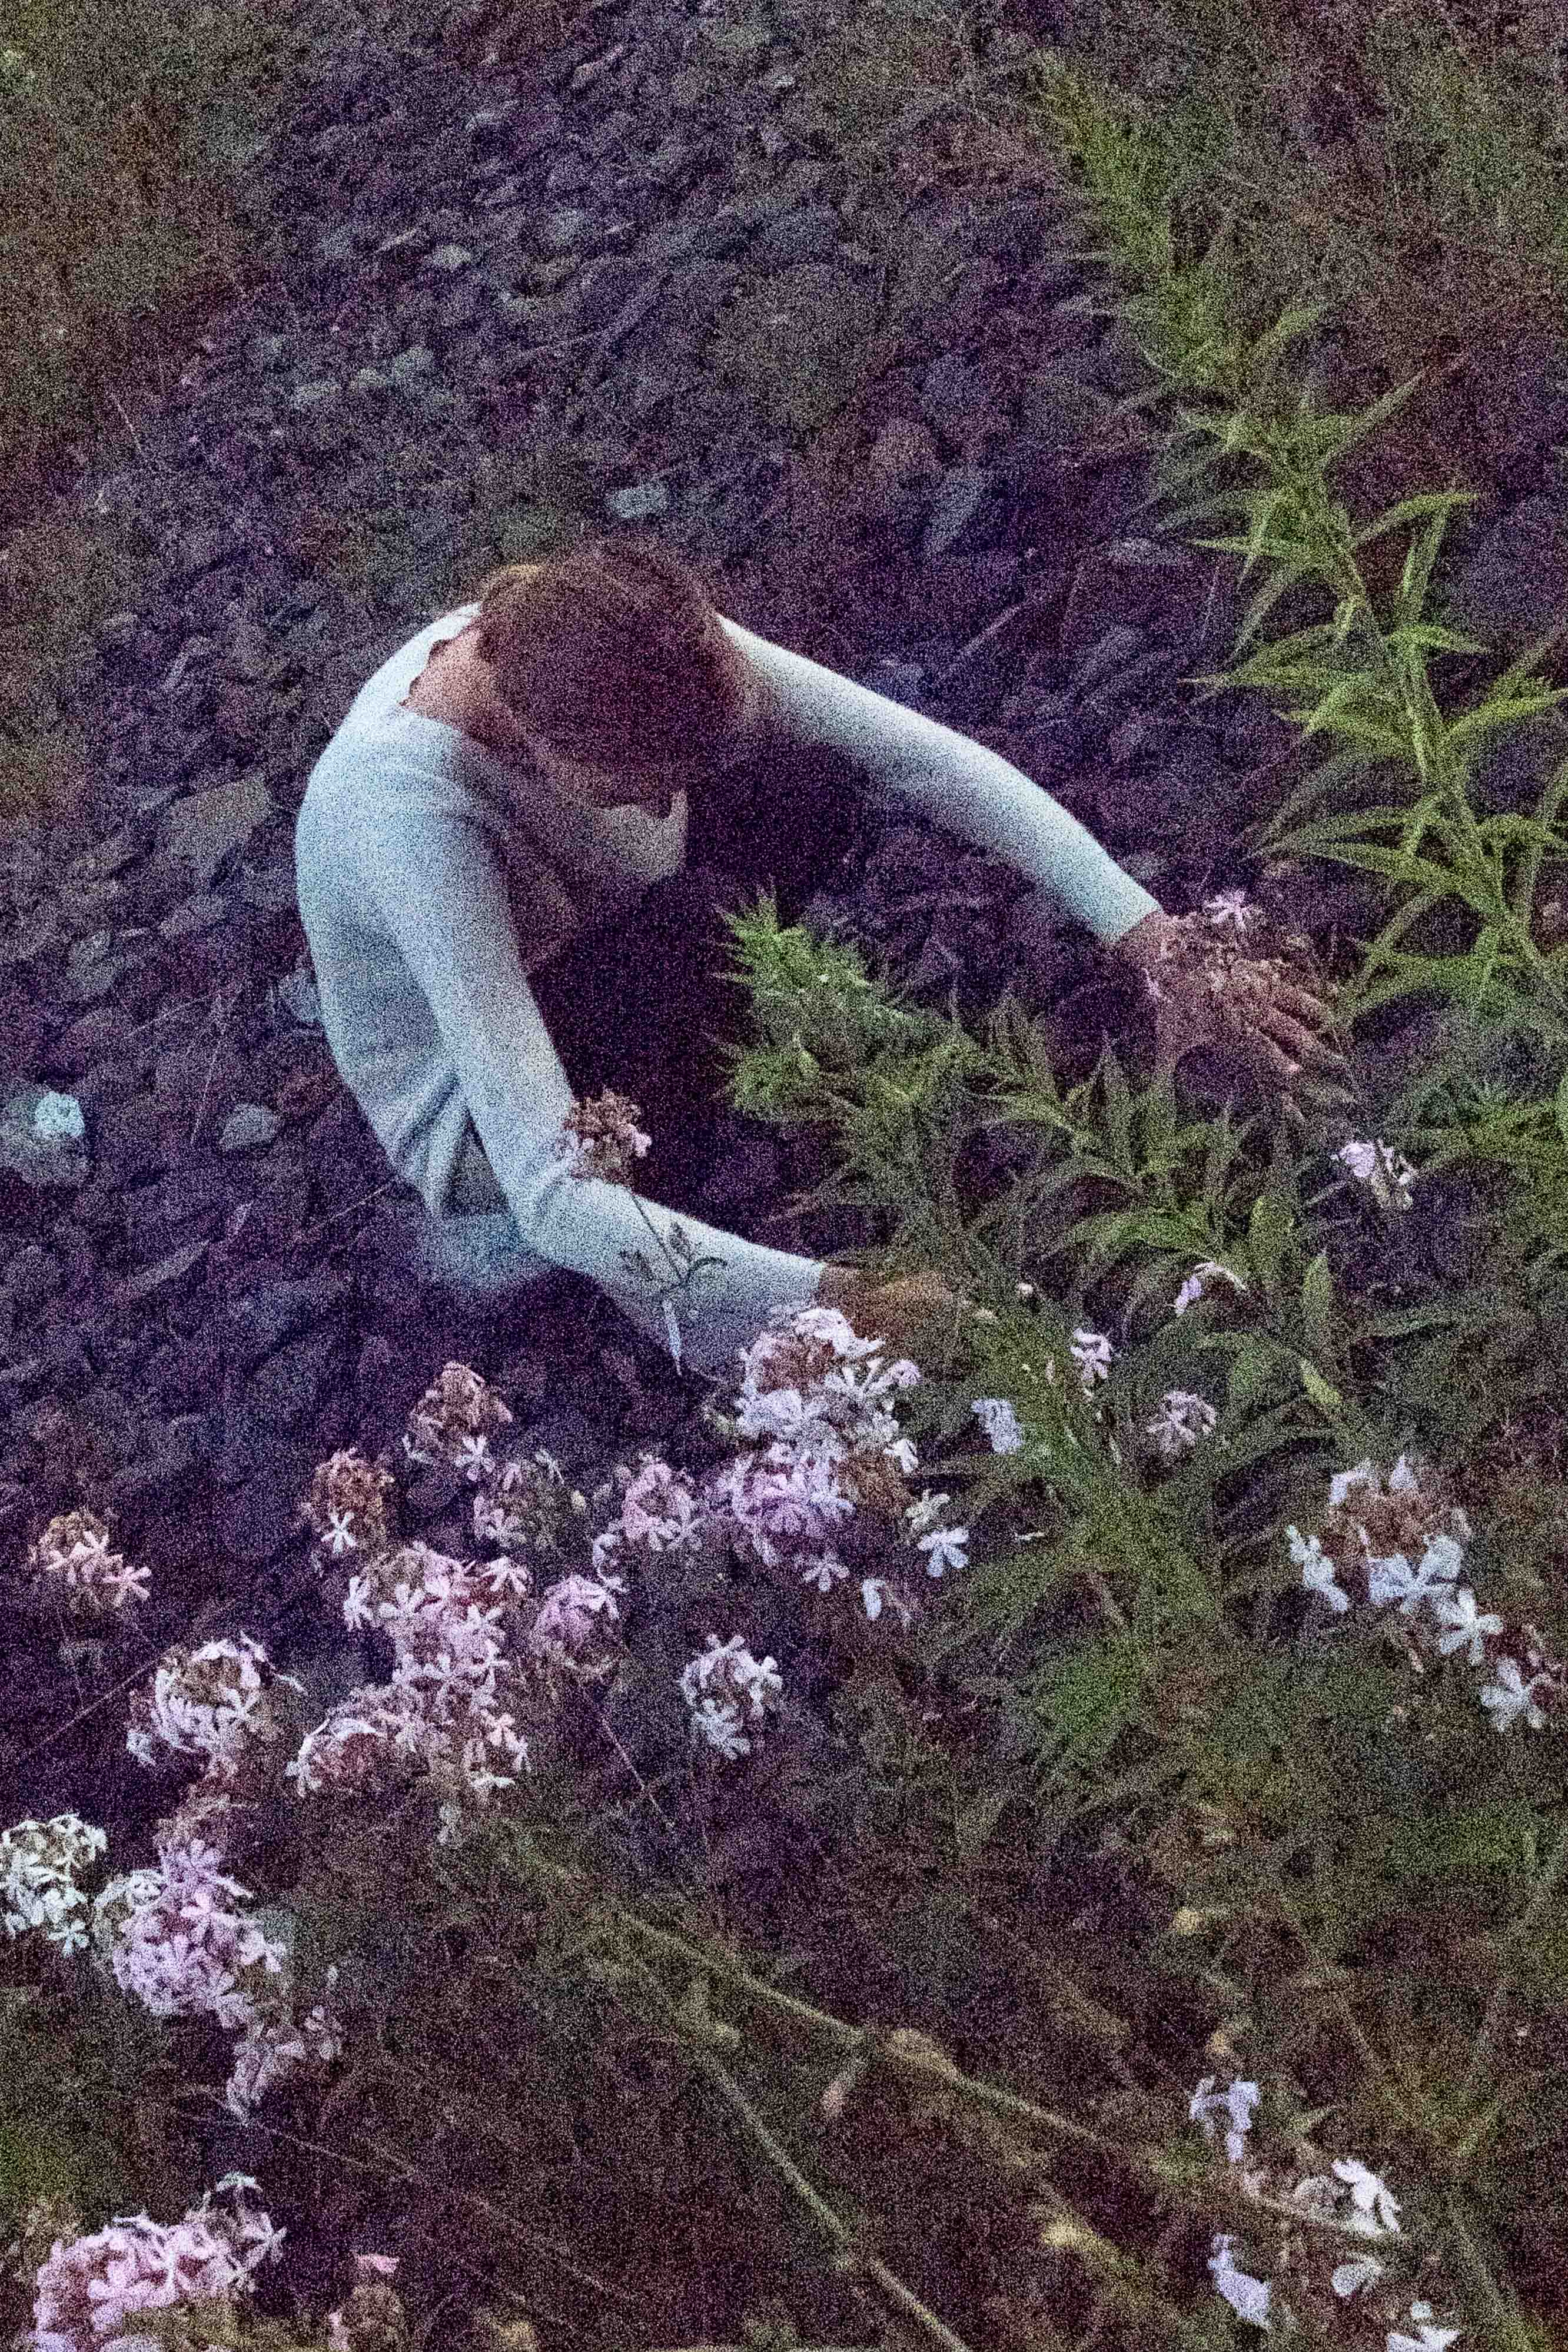 Woman kneeing down on stone ground.